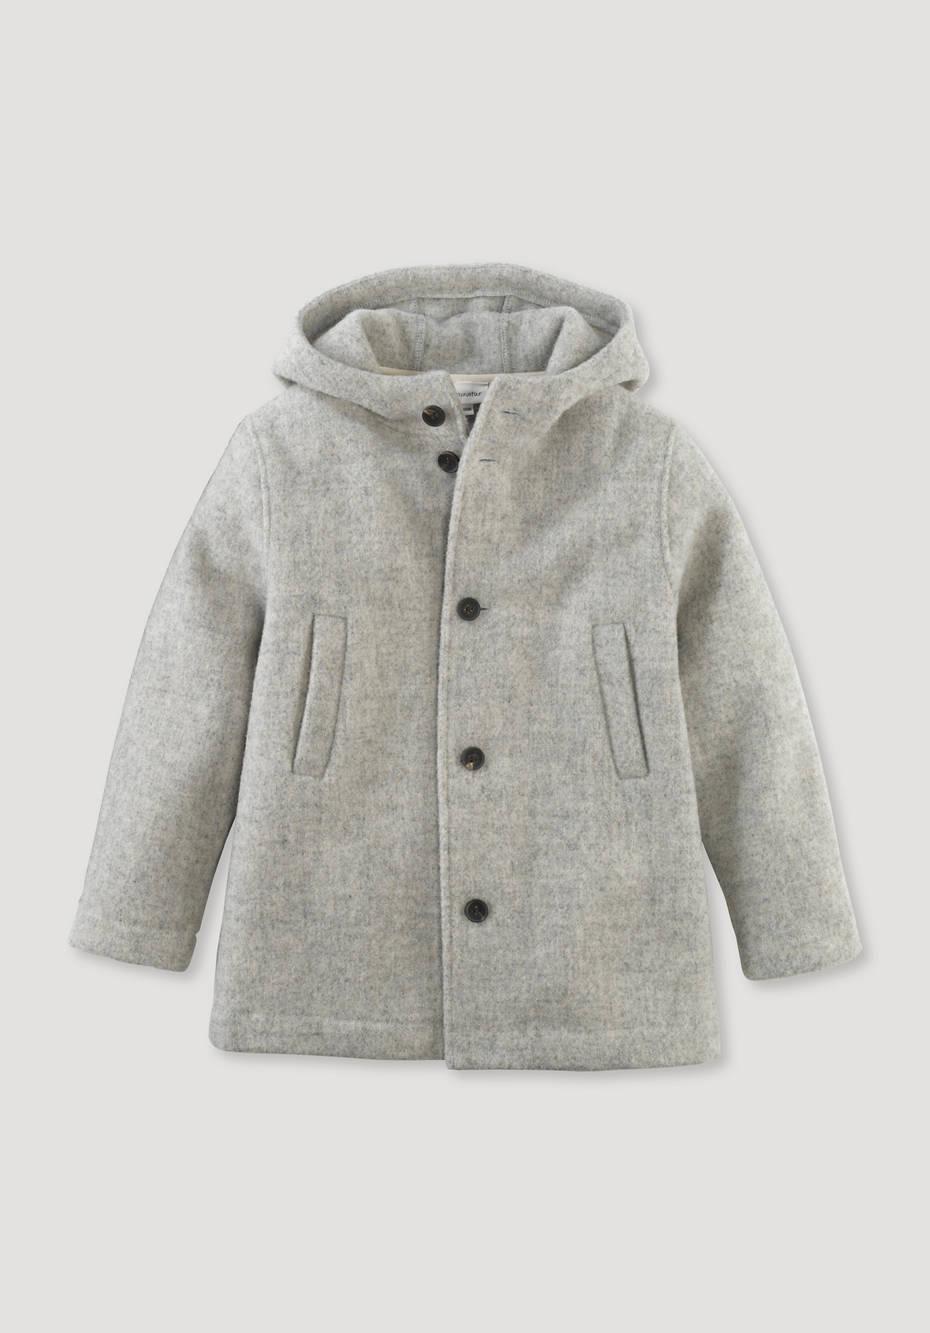 Deichschaf jacket made of pure new wool